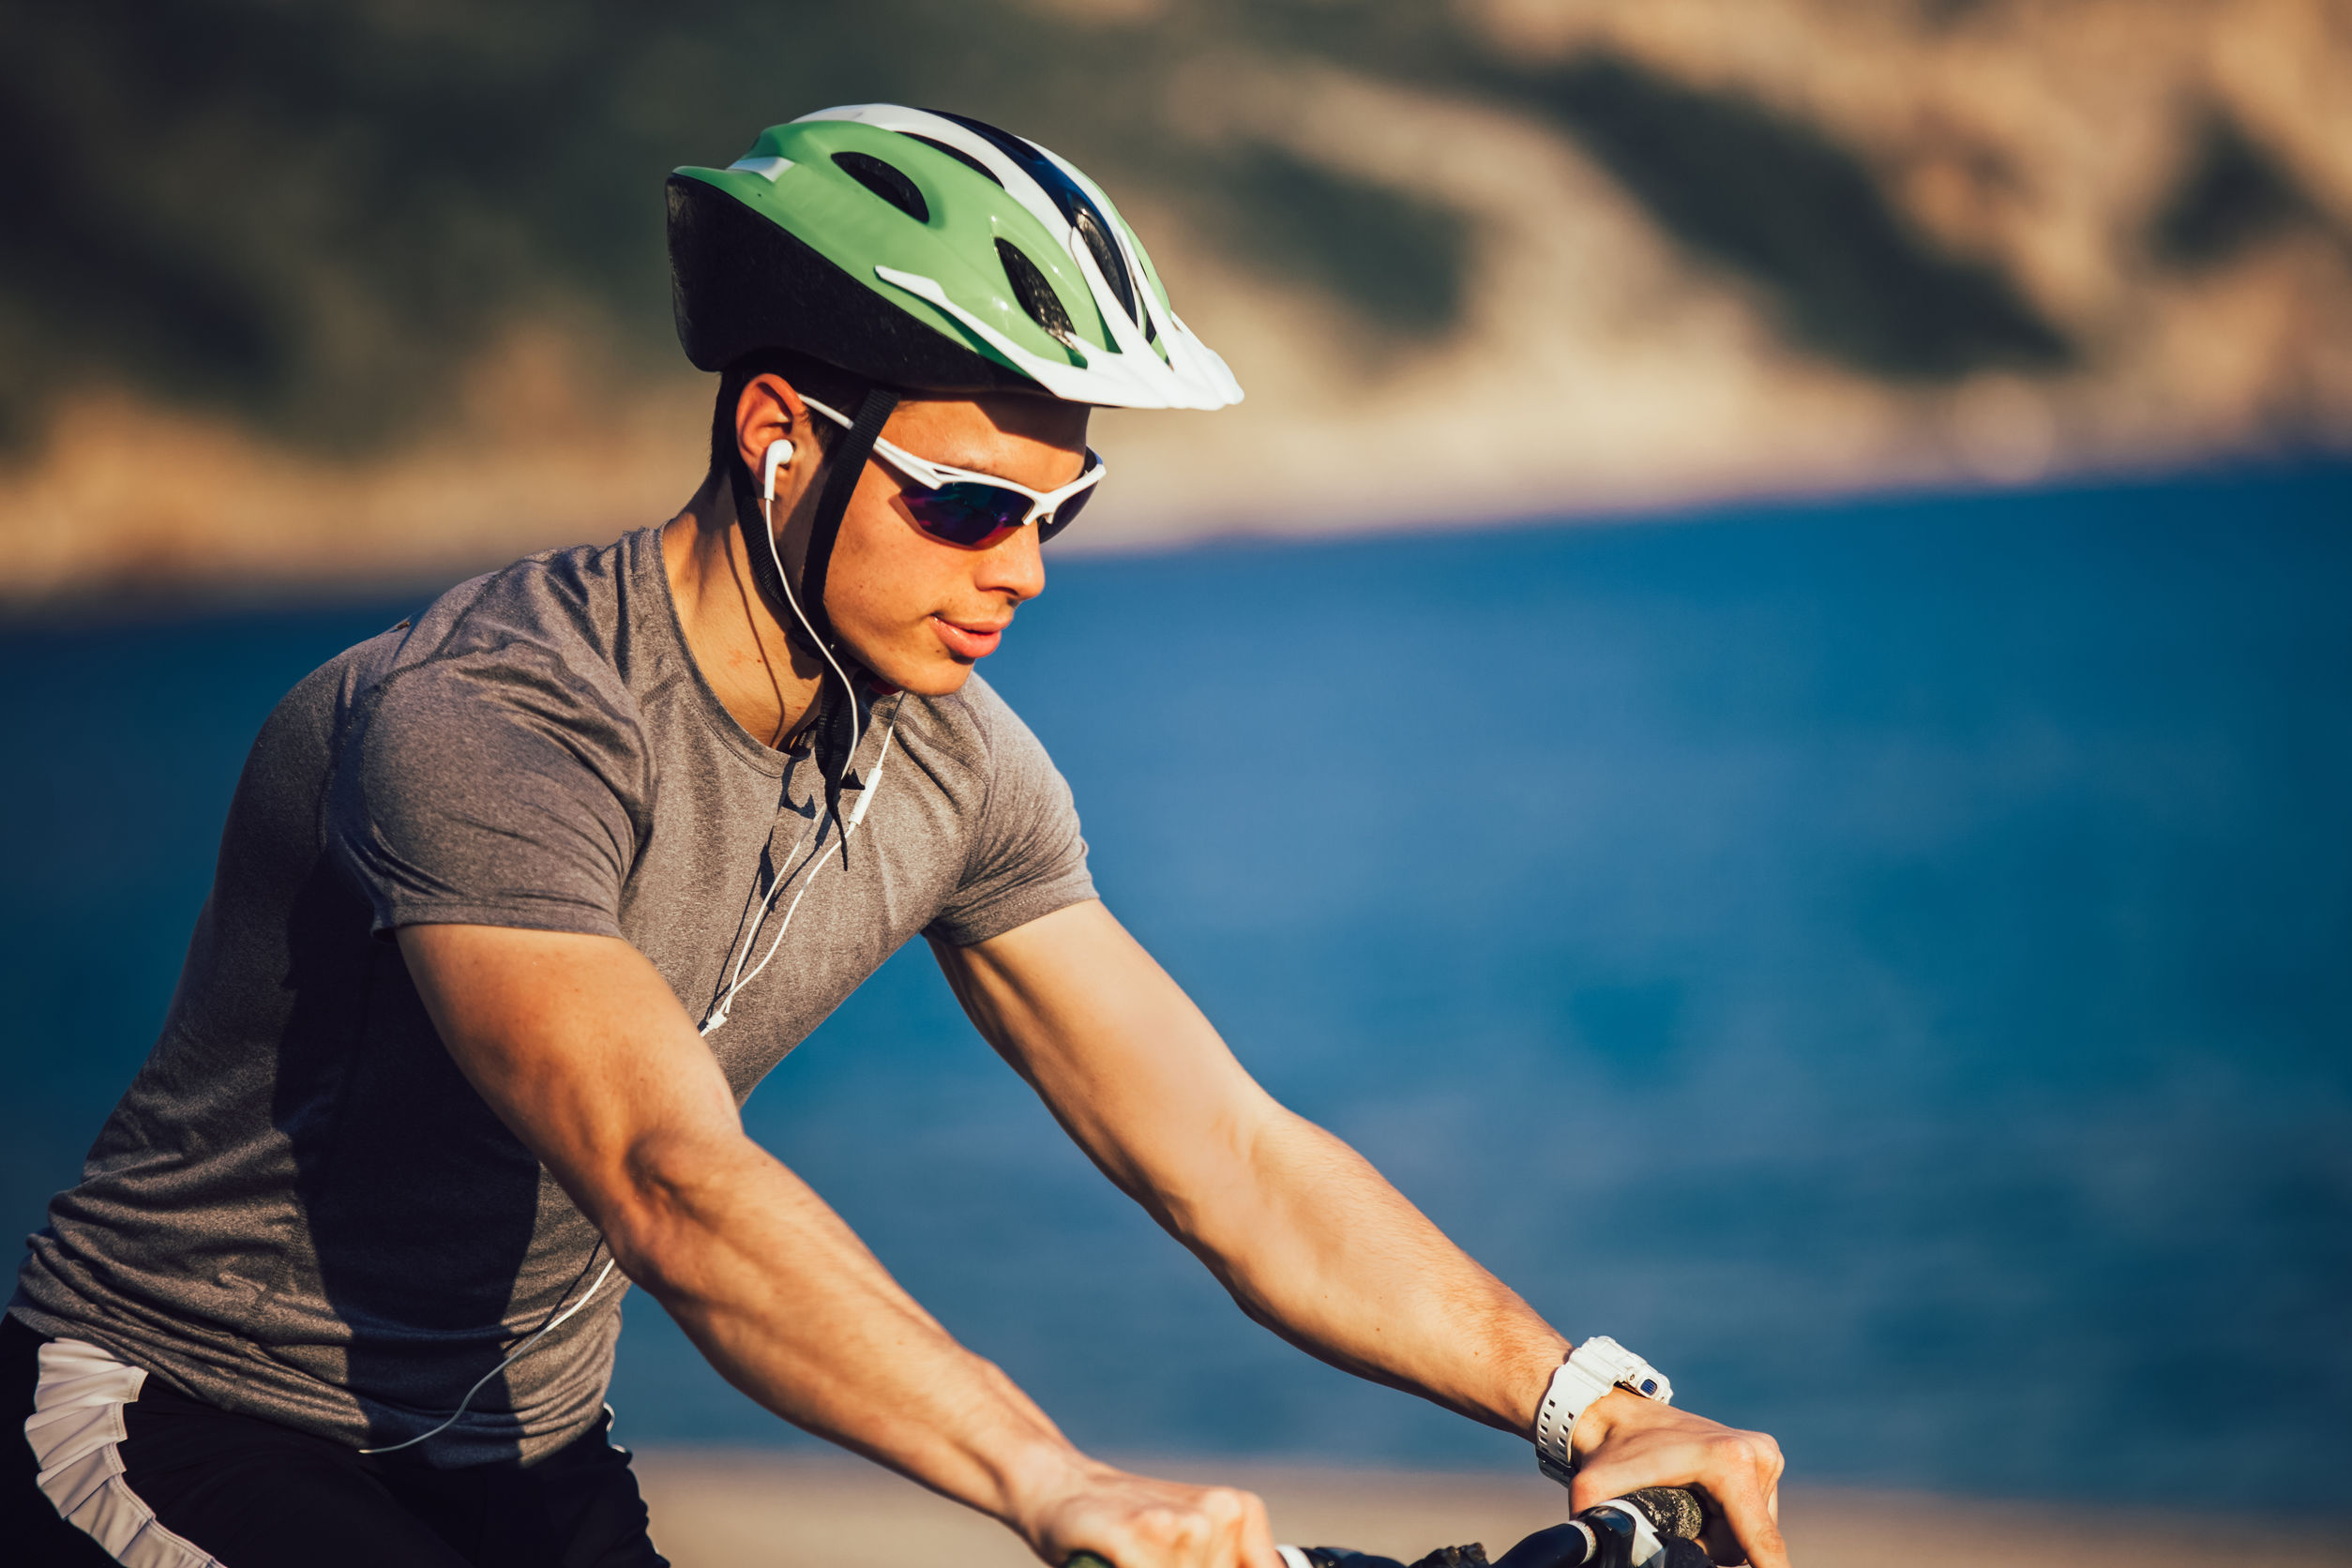 Cascos para bicicleta: ¿Cuál es el mejor del 2020?